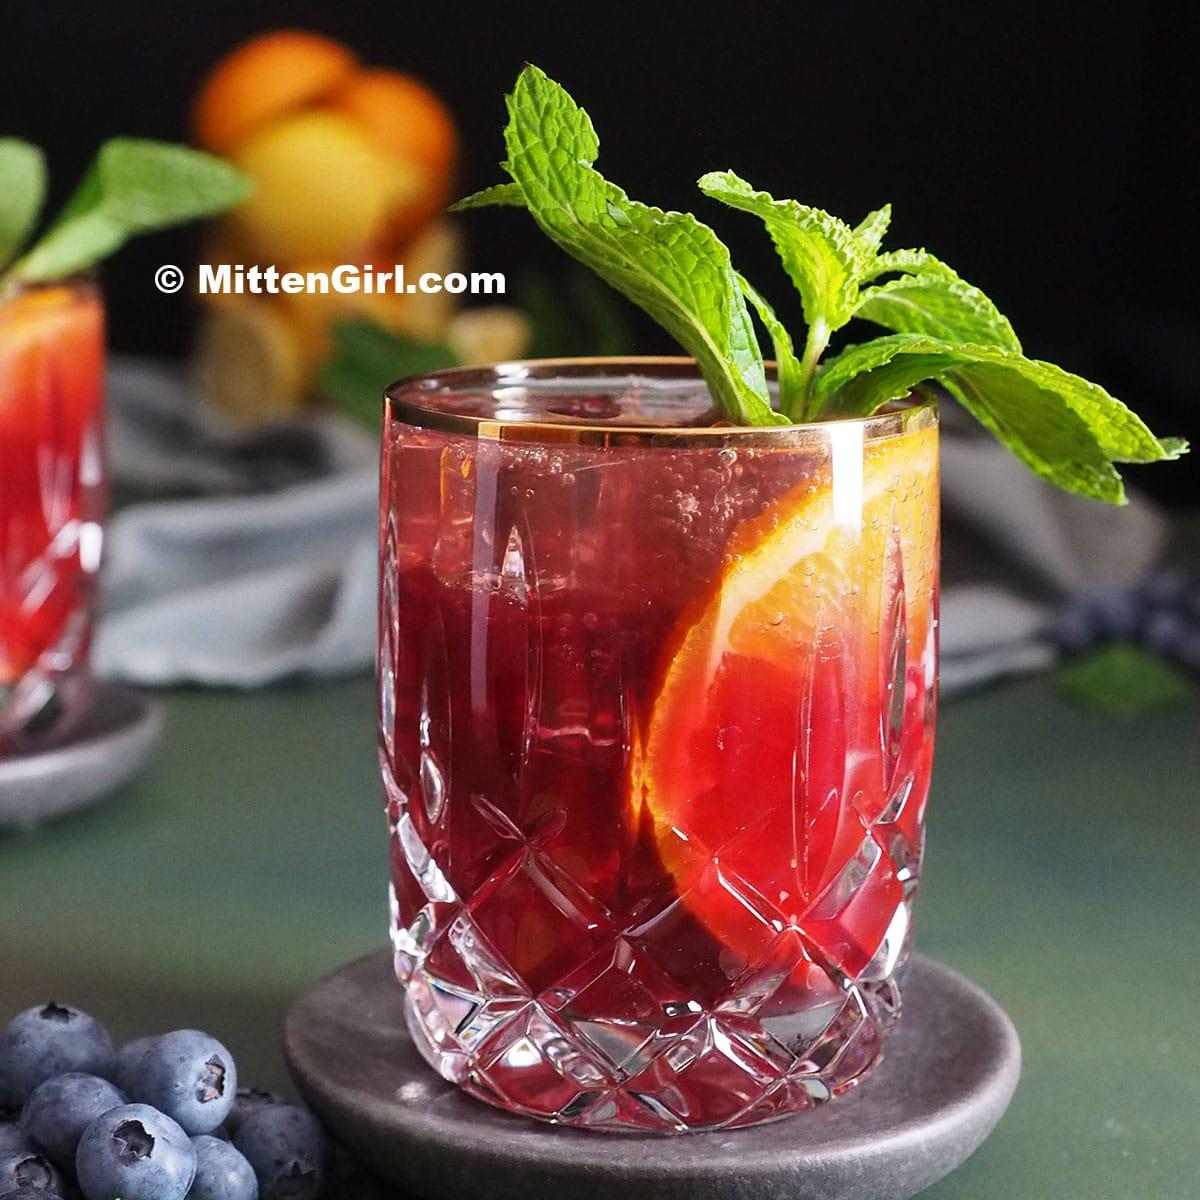 Blueberry Citrus Julep